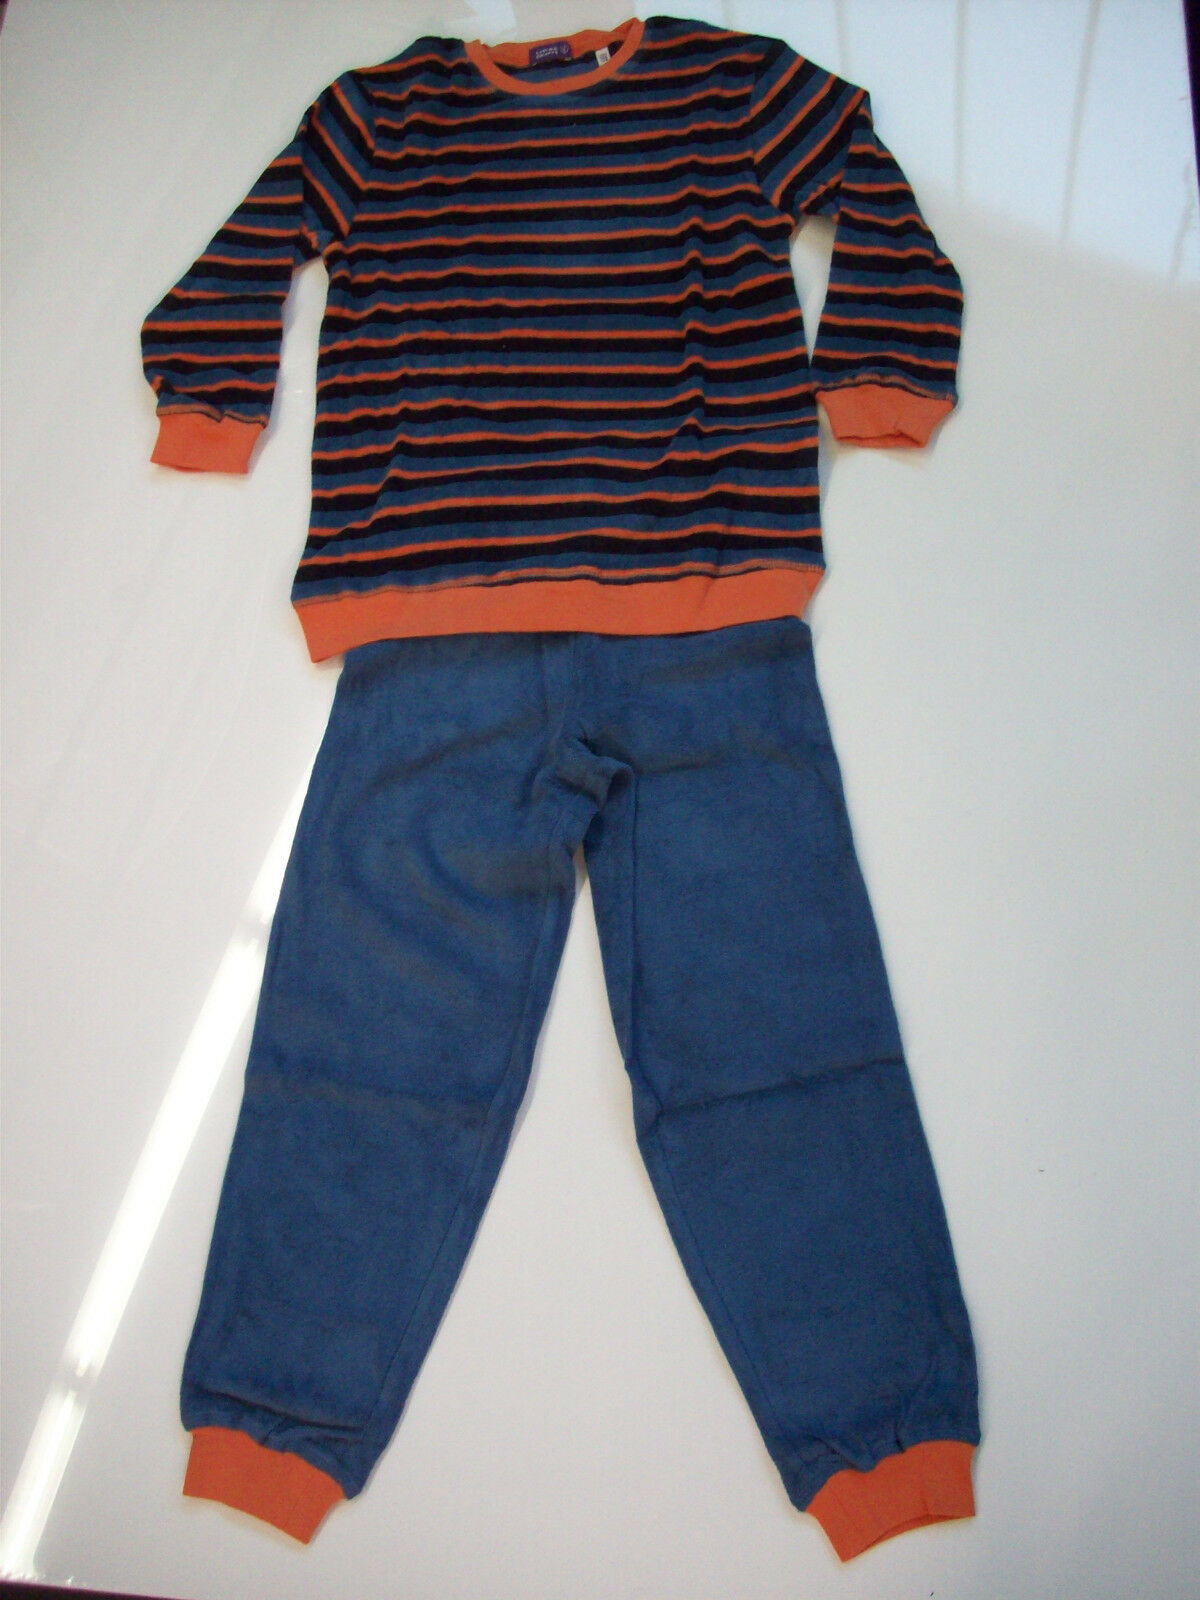 Living Crafts Kinder-Frottee-Schlafanzug Beaver in Blau/Dunkelblau/Orange